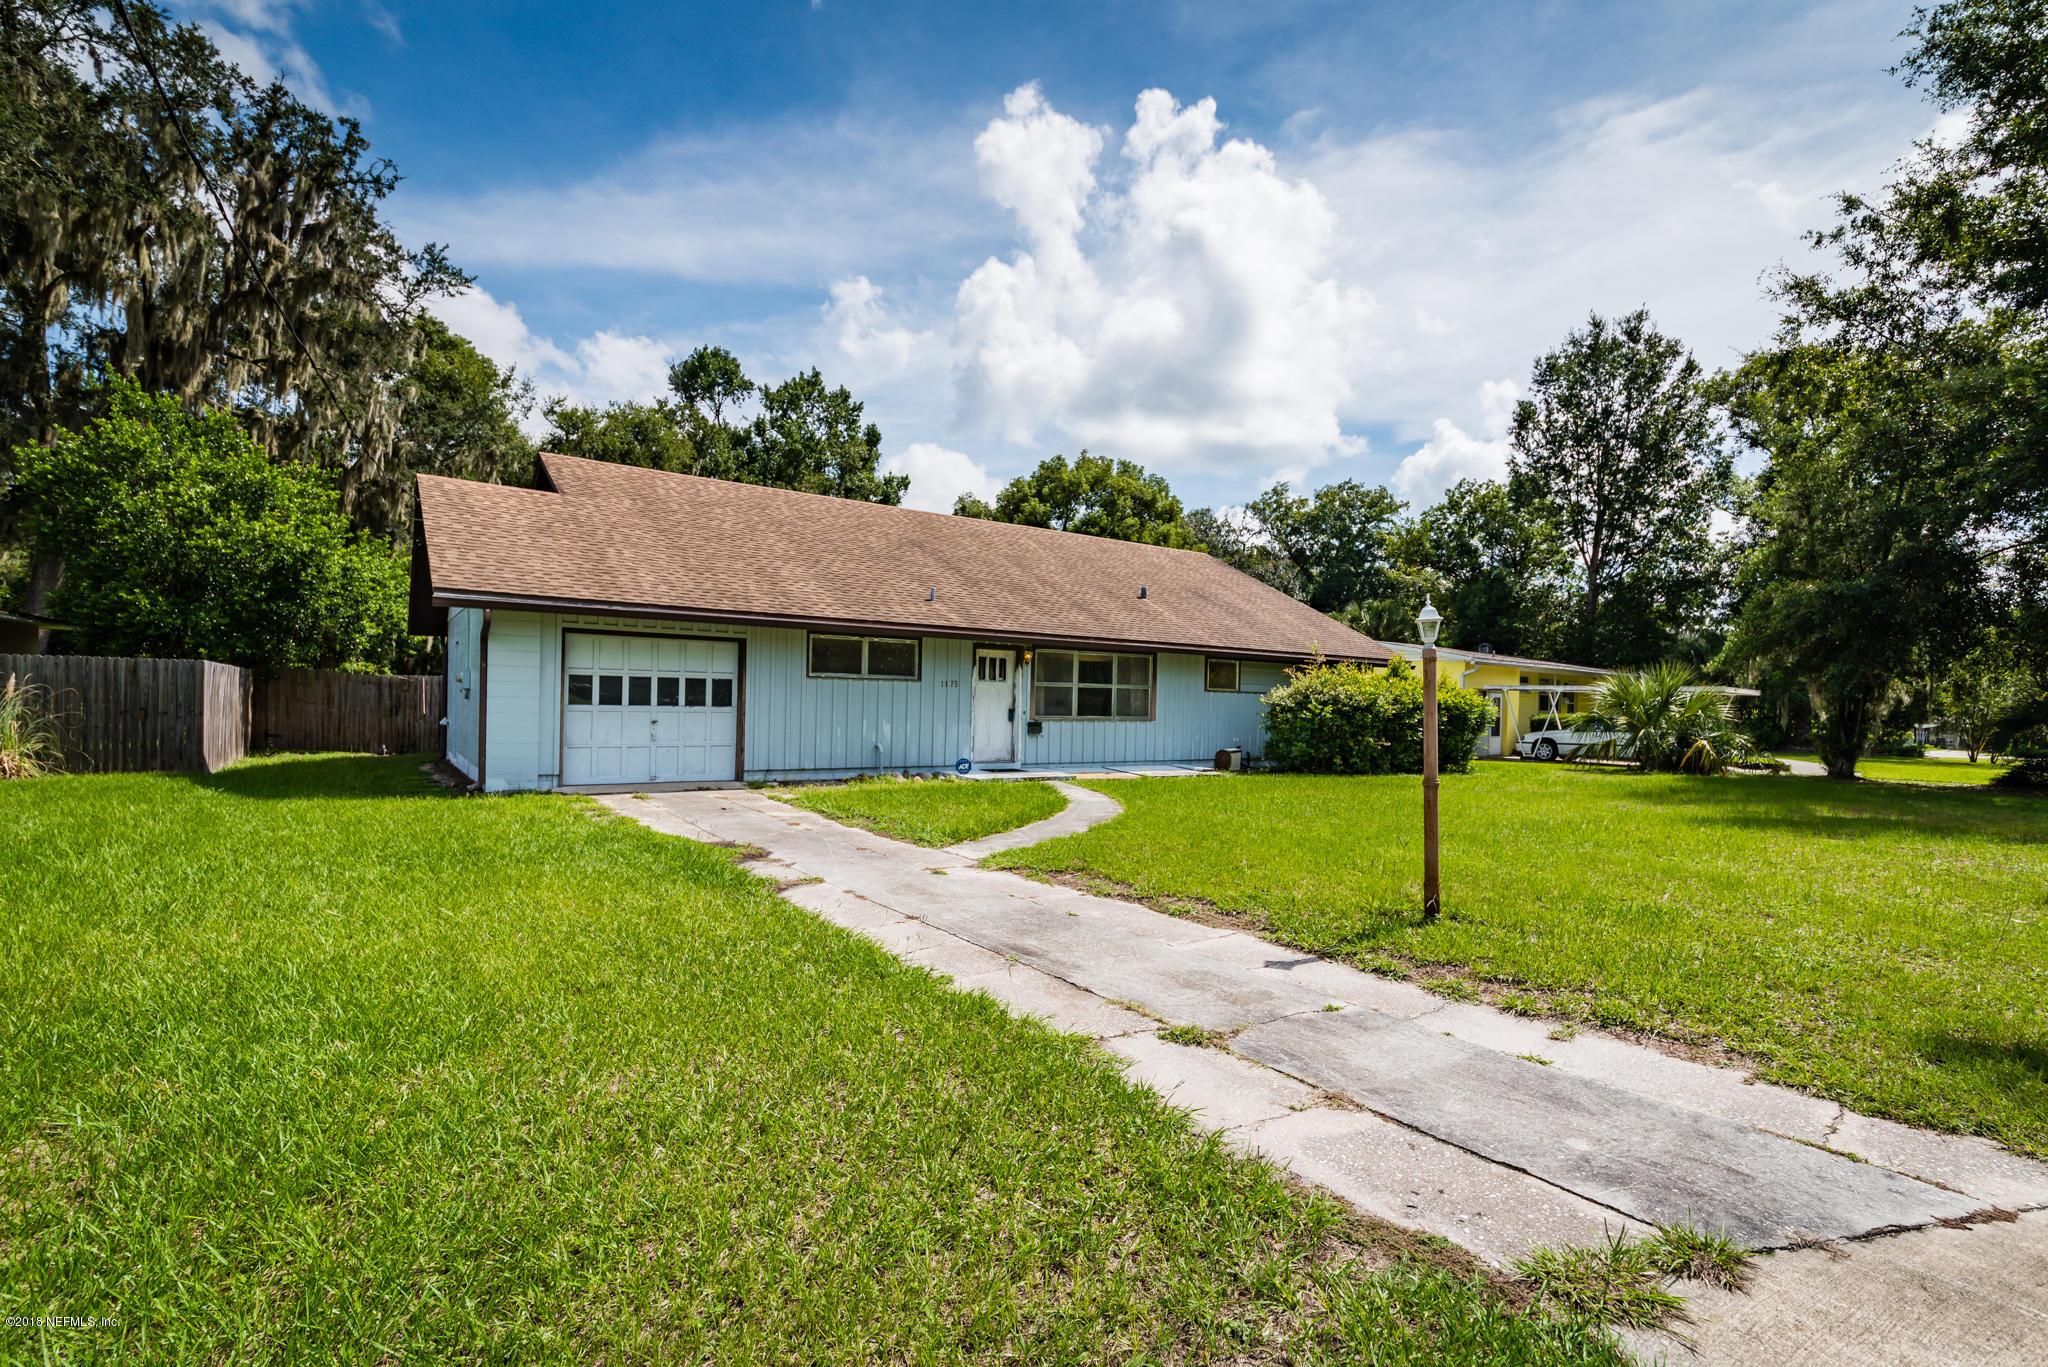 1175 NIGHTINGALE, JACKSONVILLE, FLORIDA 32216, 3 Bedrooms Bedrooms, ,2 BathroomsBathrooms,Residential - single family,For sale,NIGHTINGALE,956494